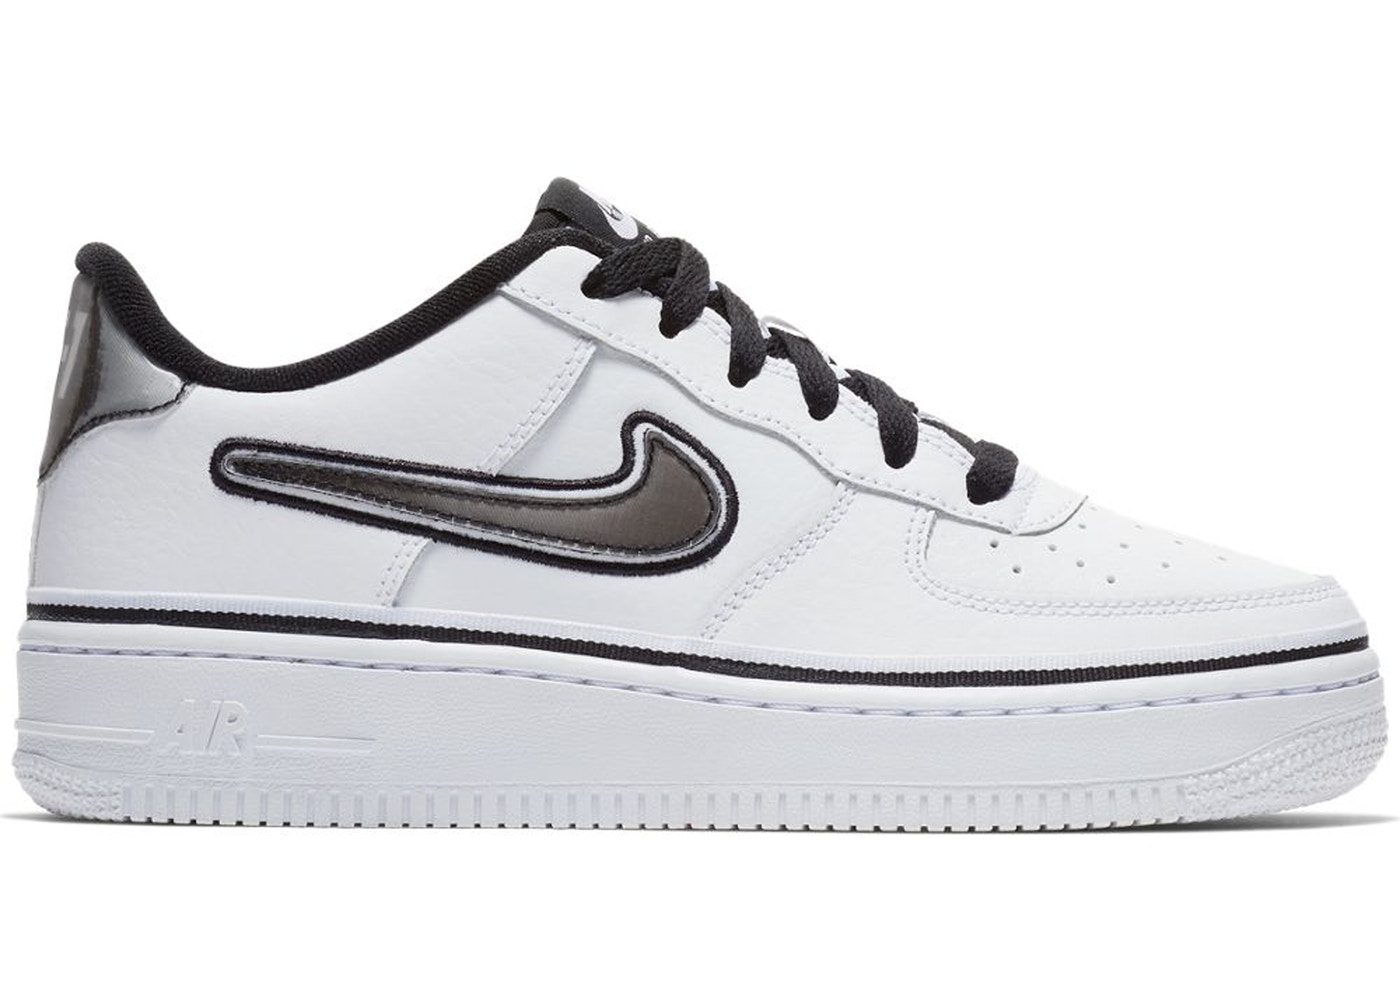 Nike Air Force 1 Low NBA White Black (GS)